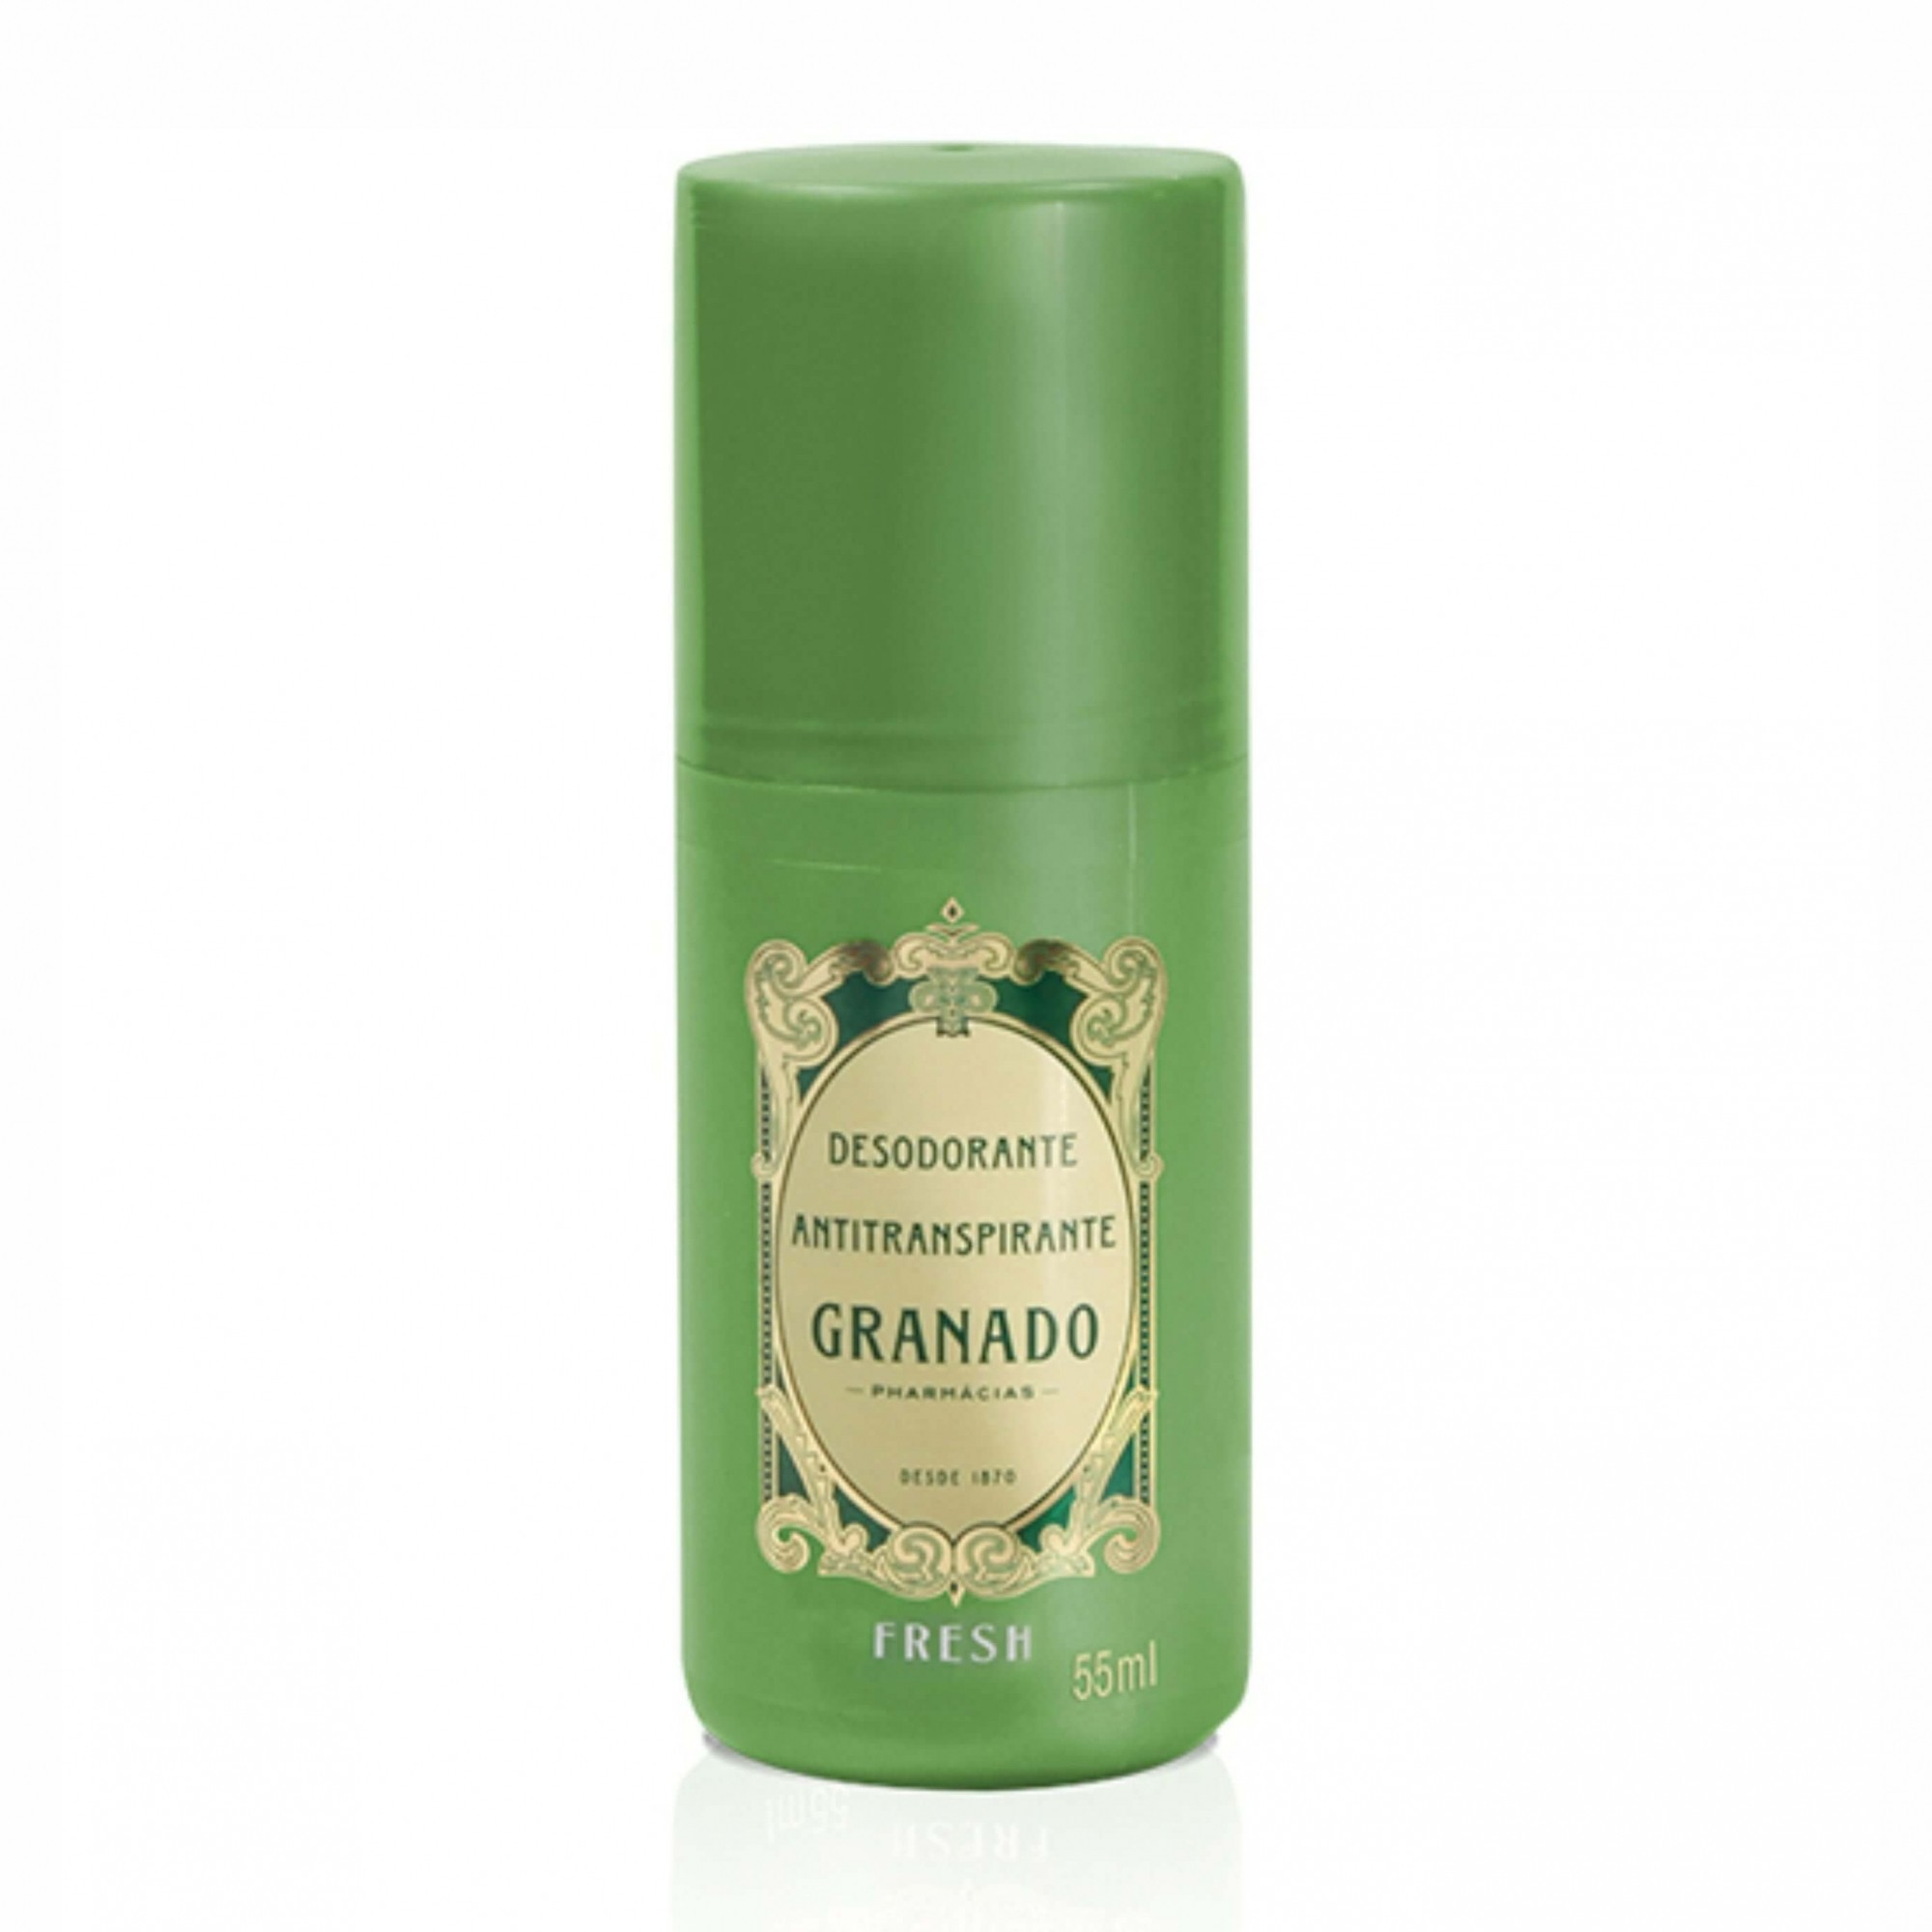 Desodorante Antitranspirante Fresh Granado 55ml